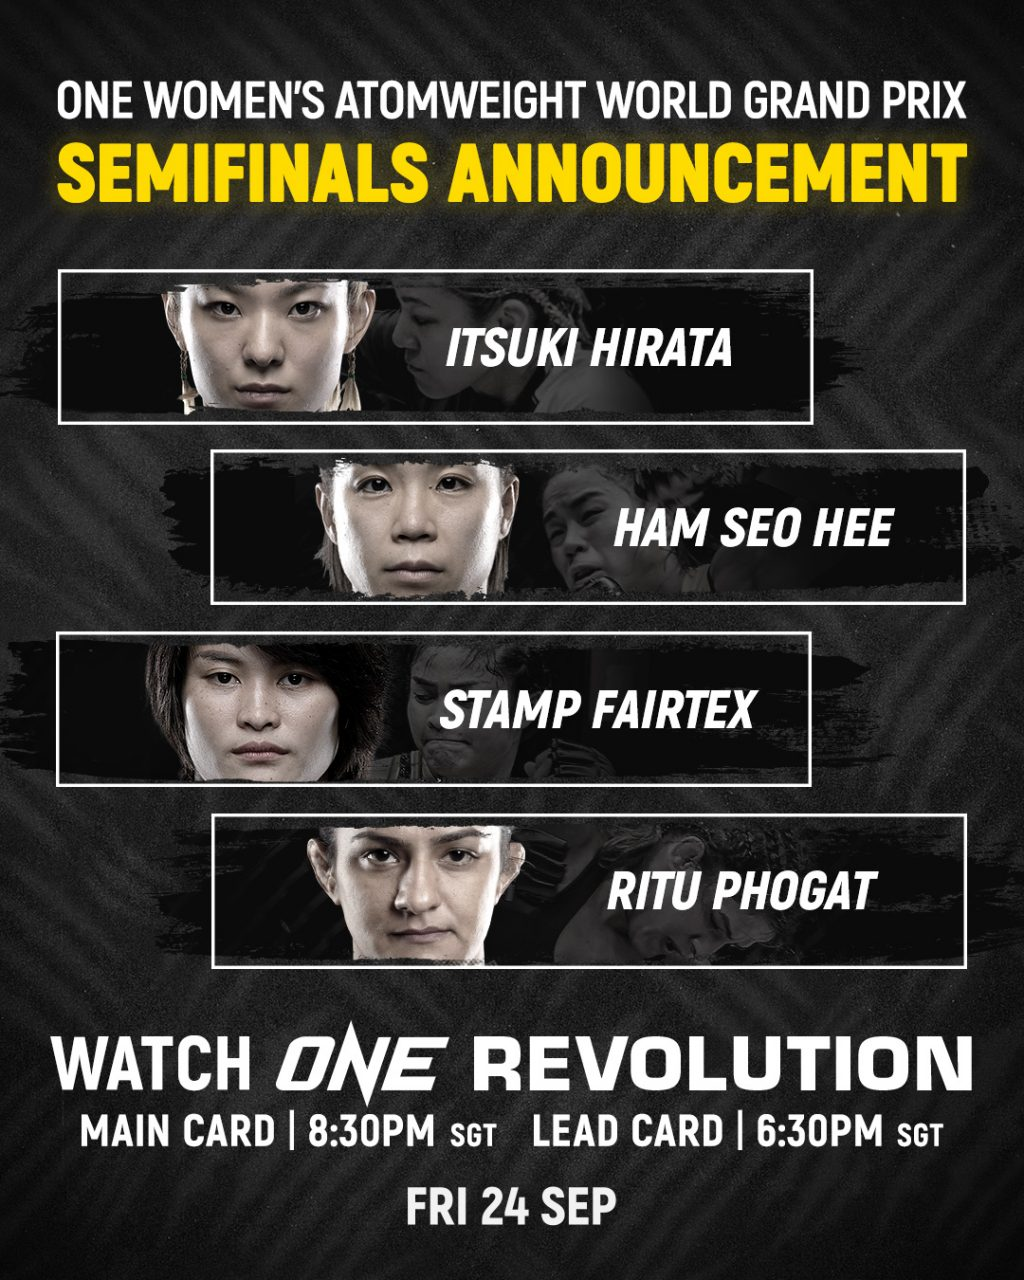 ONE Atomweight Grand Prix semi-finals